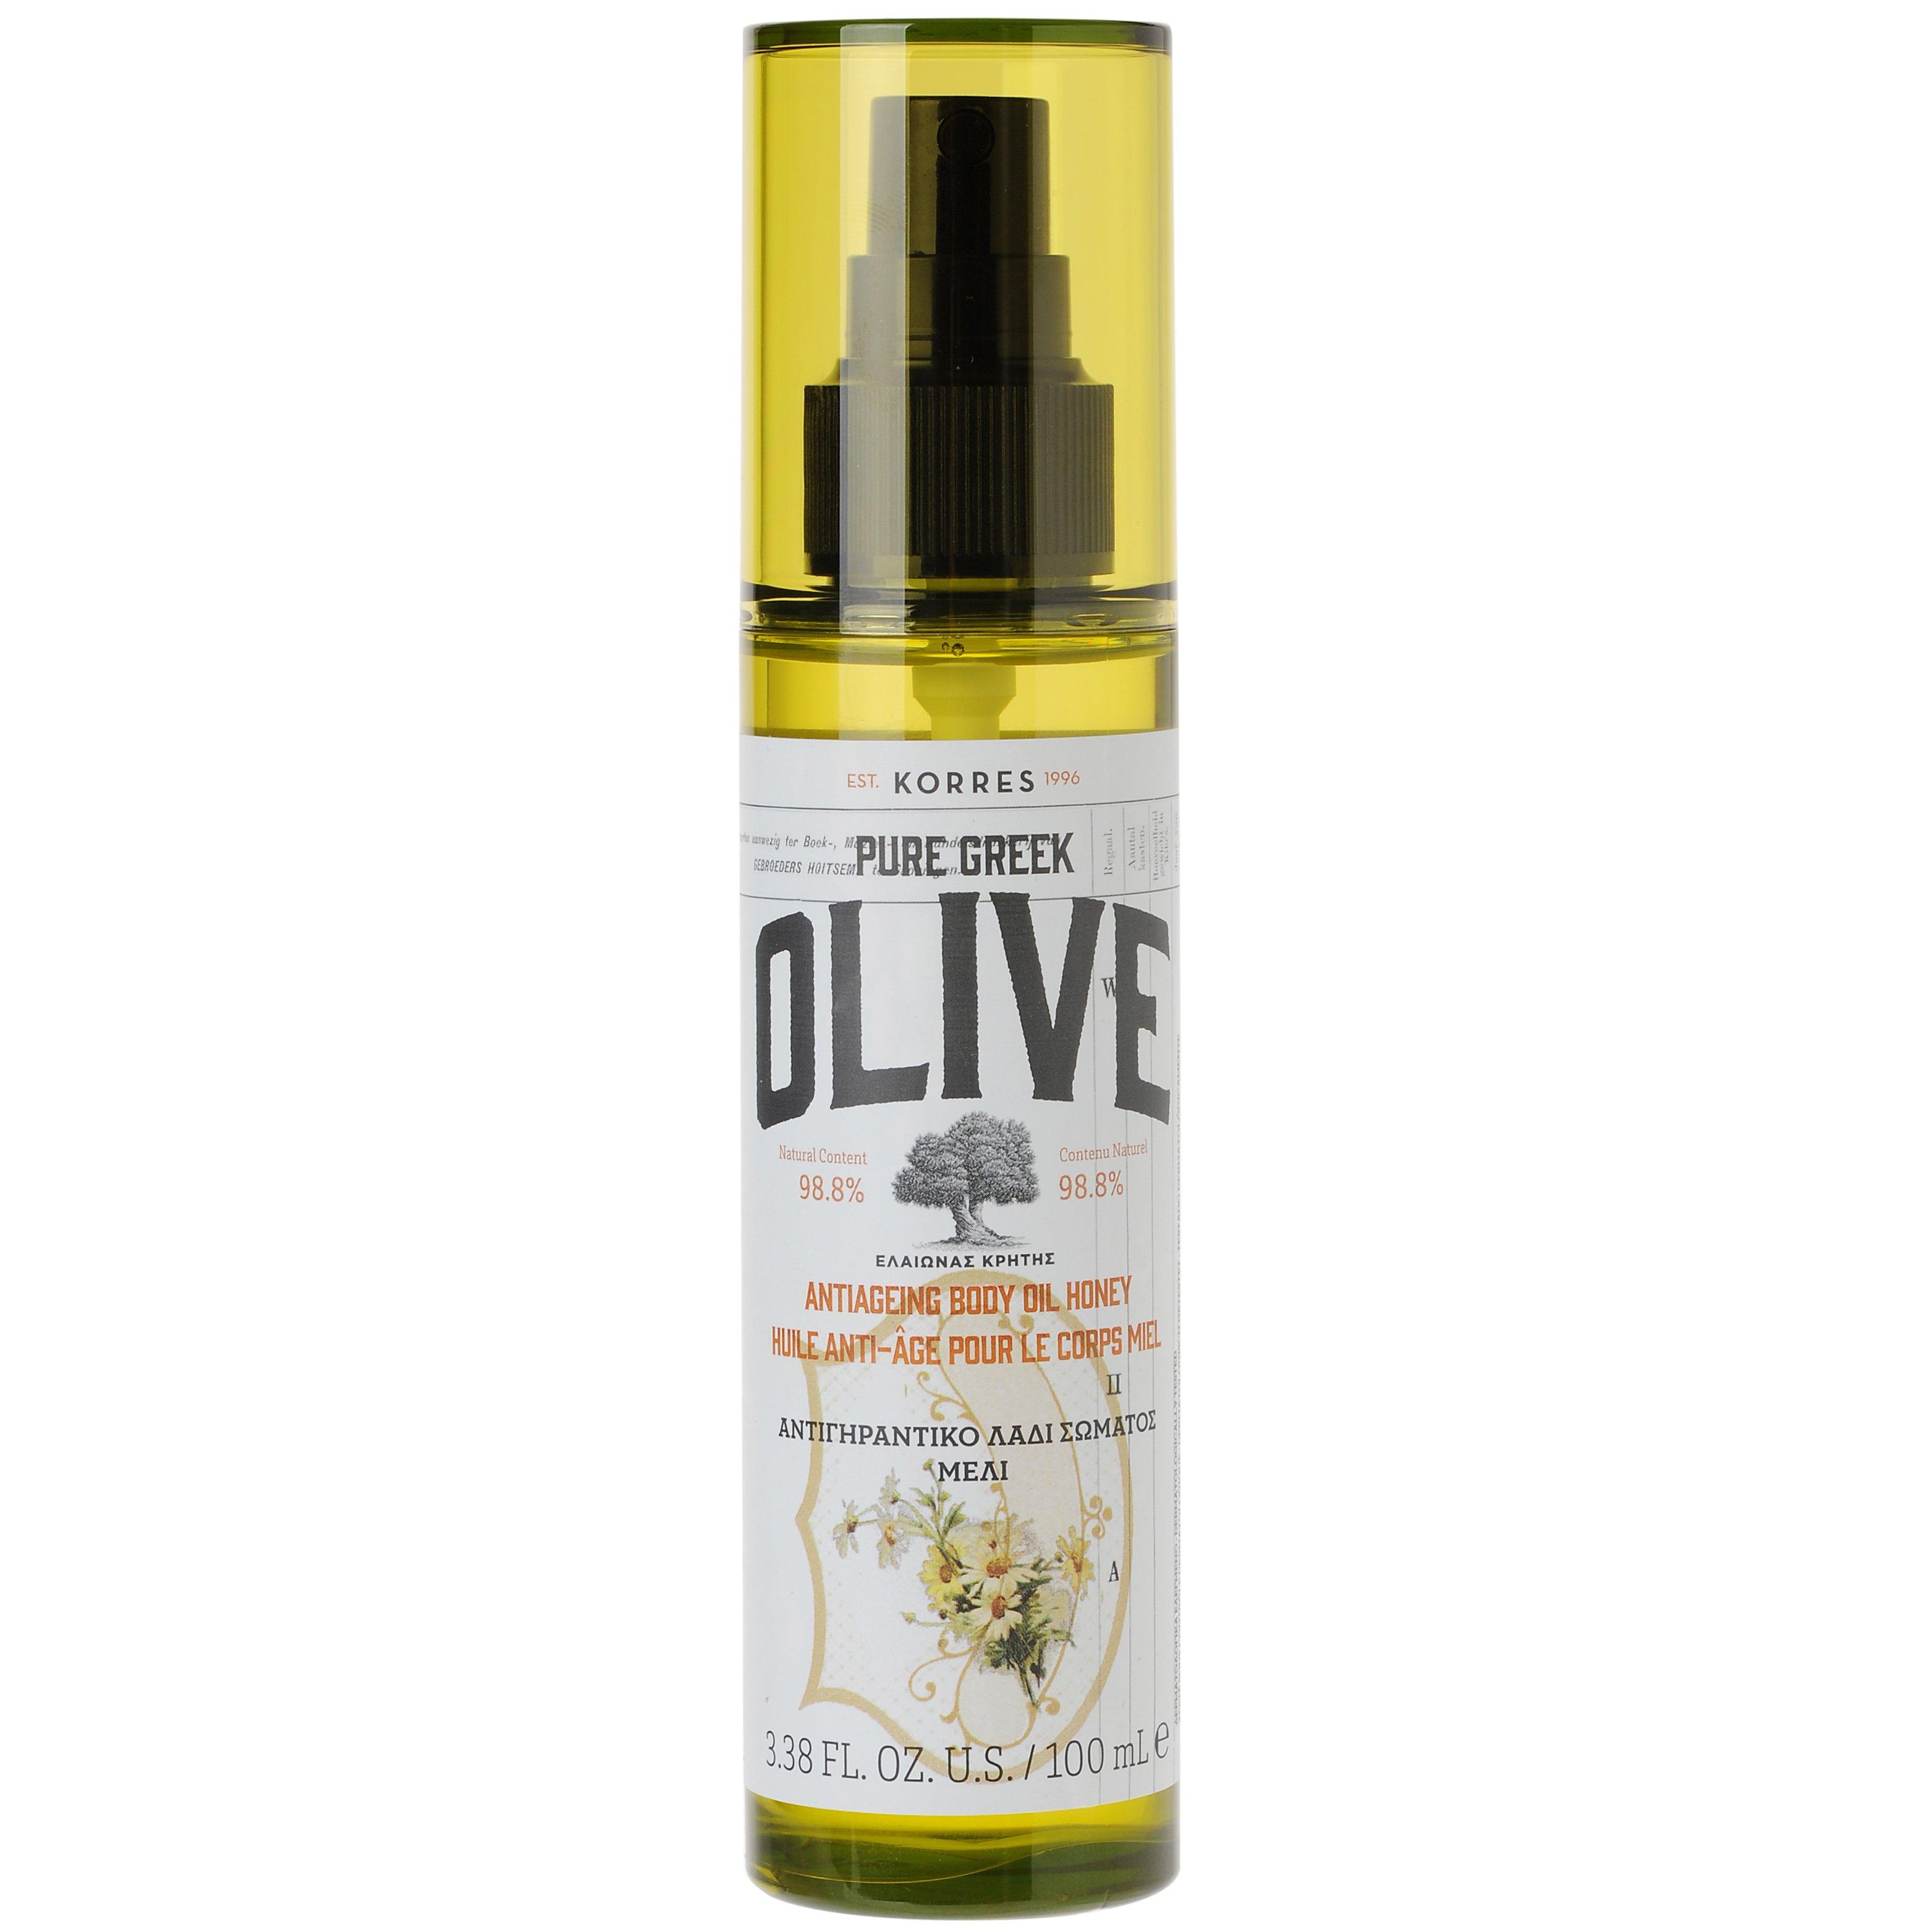 Korres Pure Greek Olive Antiageing Body Oil Honey Αντιγηραντικό, Εξαιρετικά Ενυδατικό Ξηρό Λάδι Σώματος με Άρωμα Μέλι 100ml